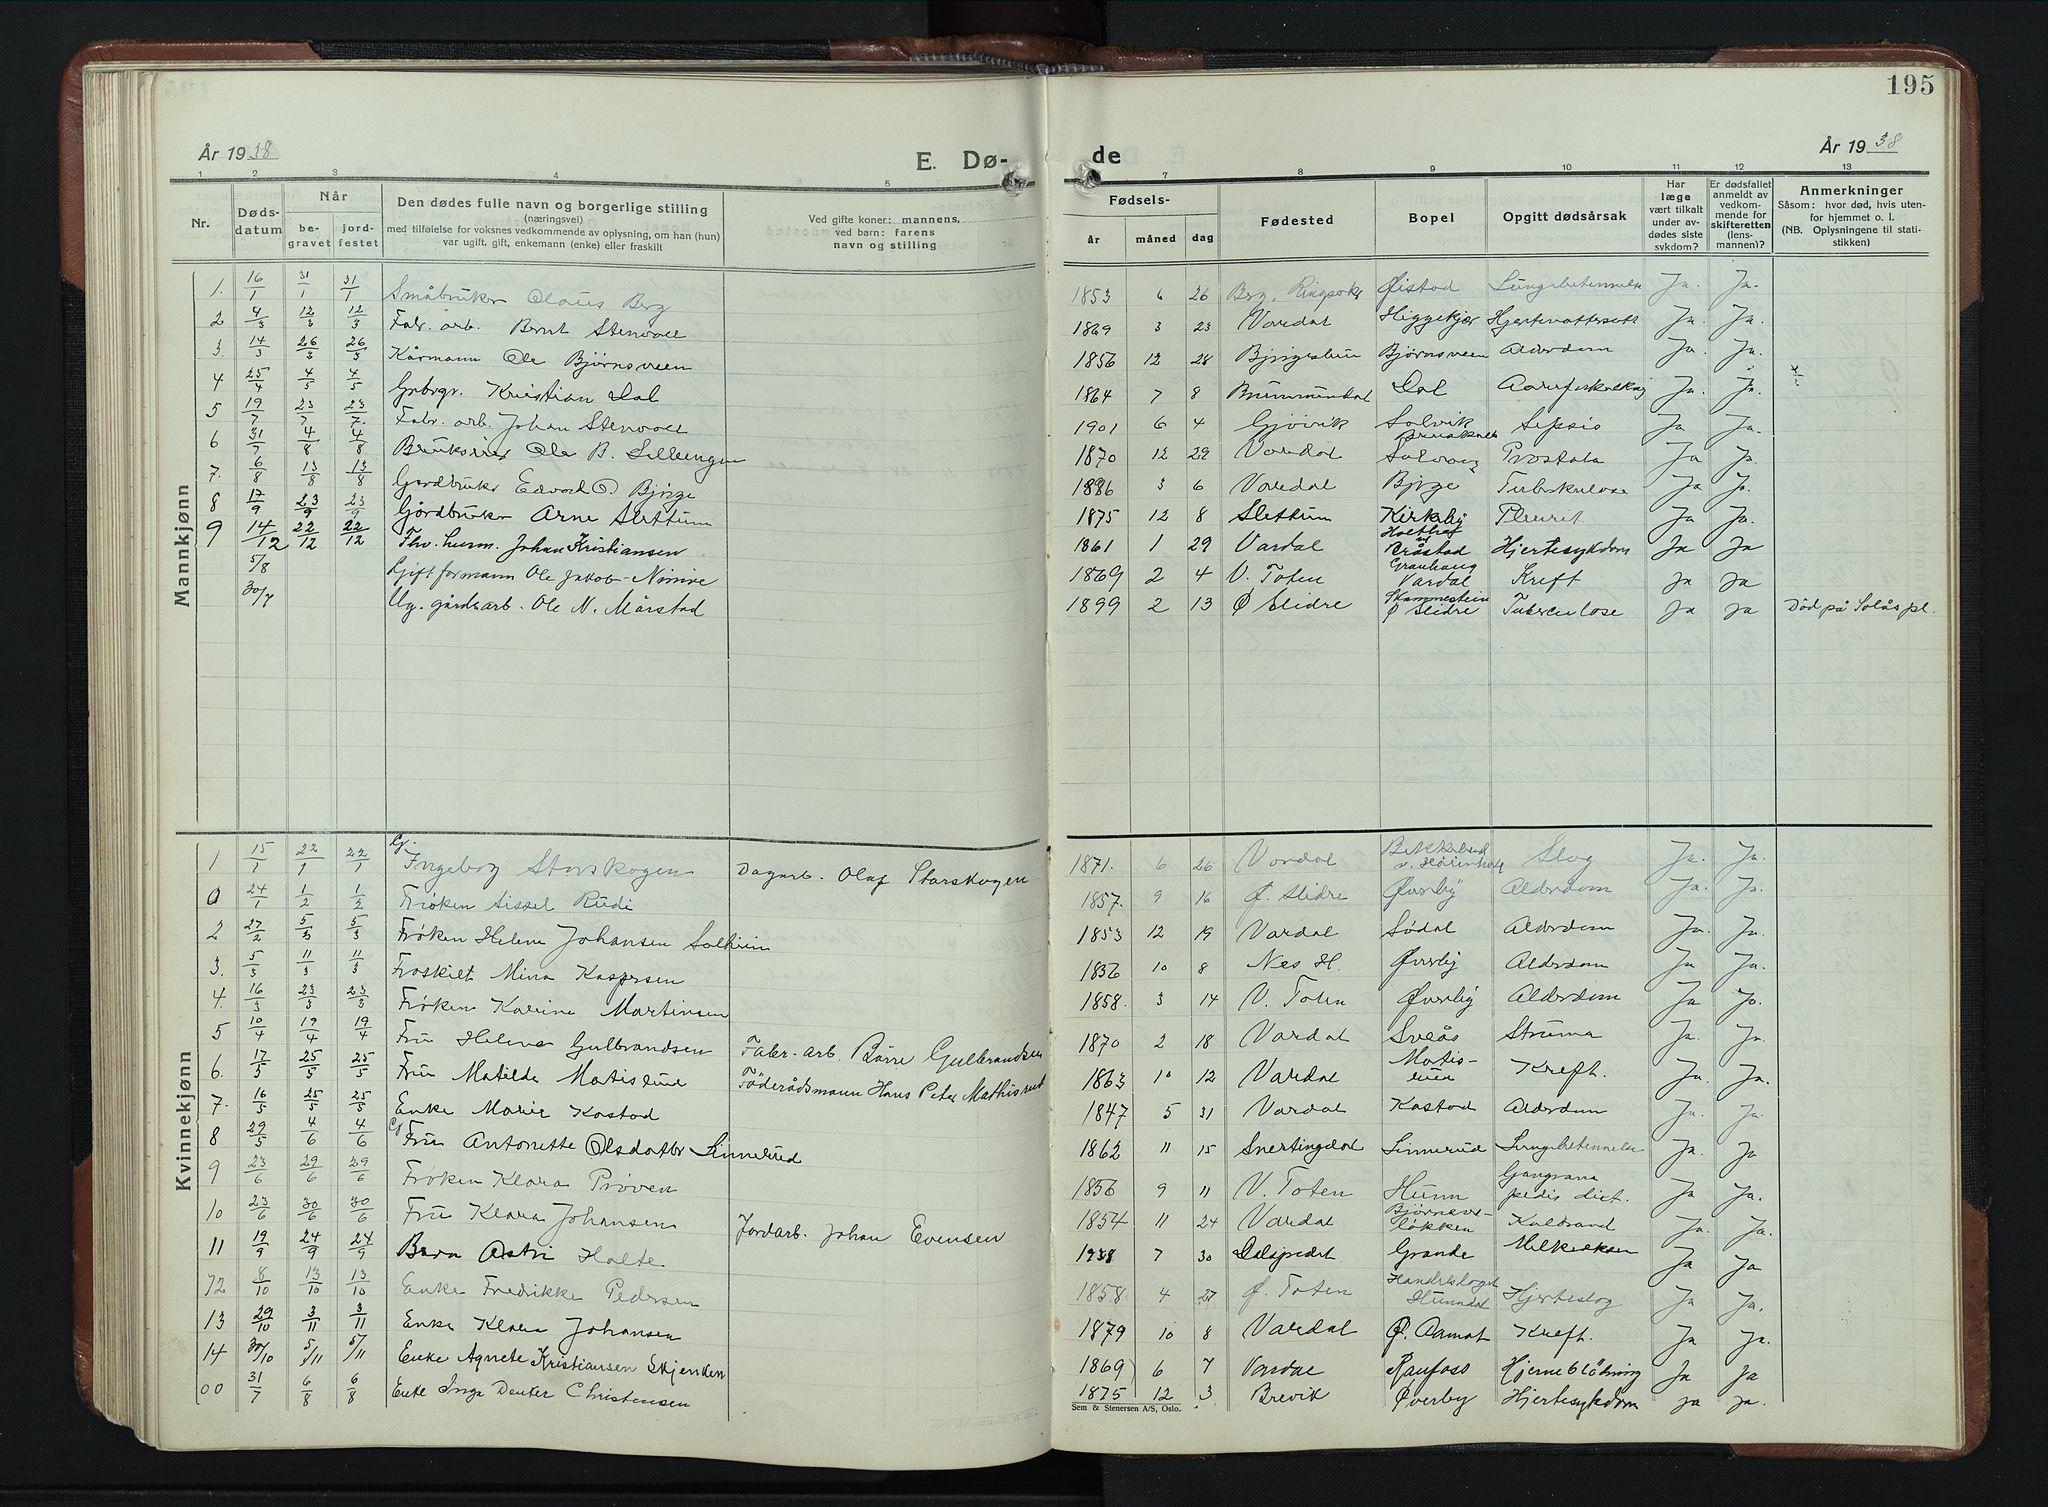 SAH, Vardal prestekontor, H/Ha/Hab/L0023: Klokkerbok nr. 23, 1929-1941, s. 195